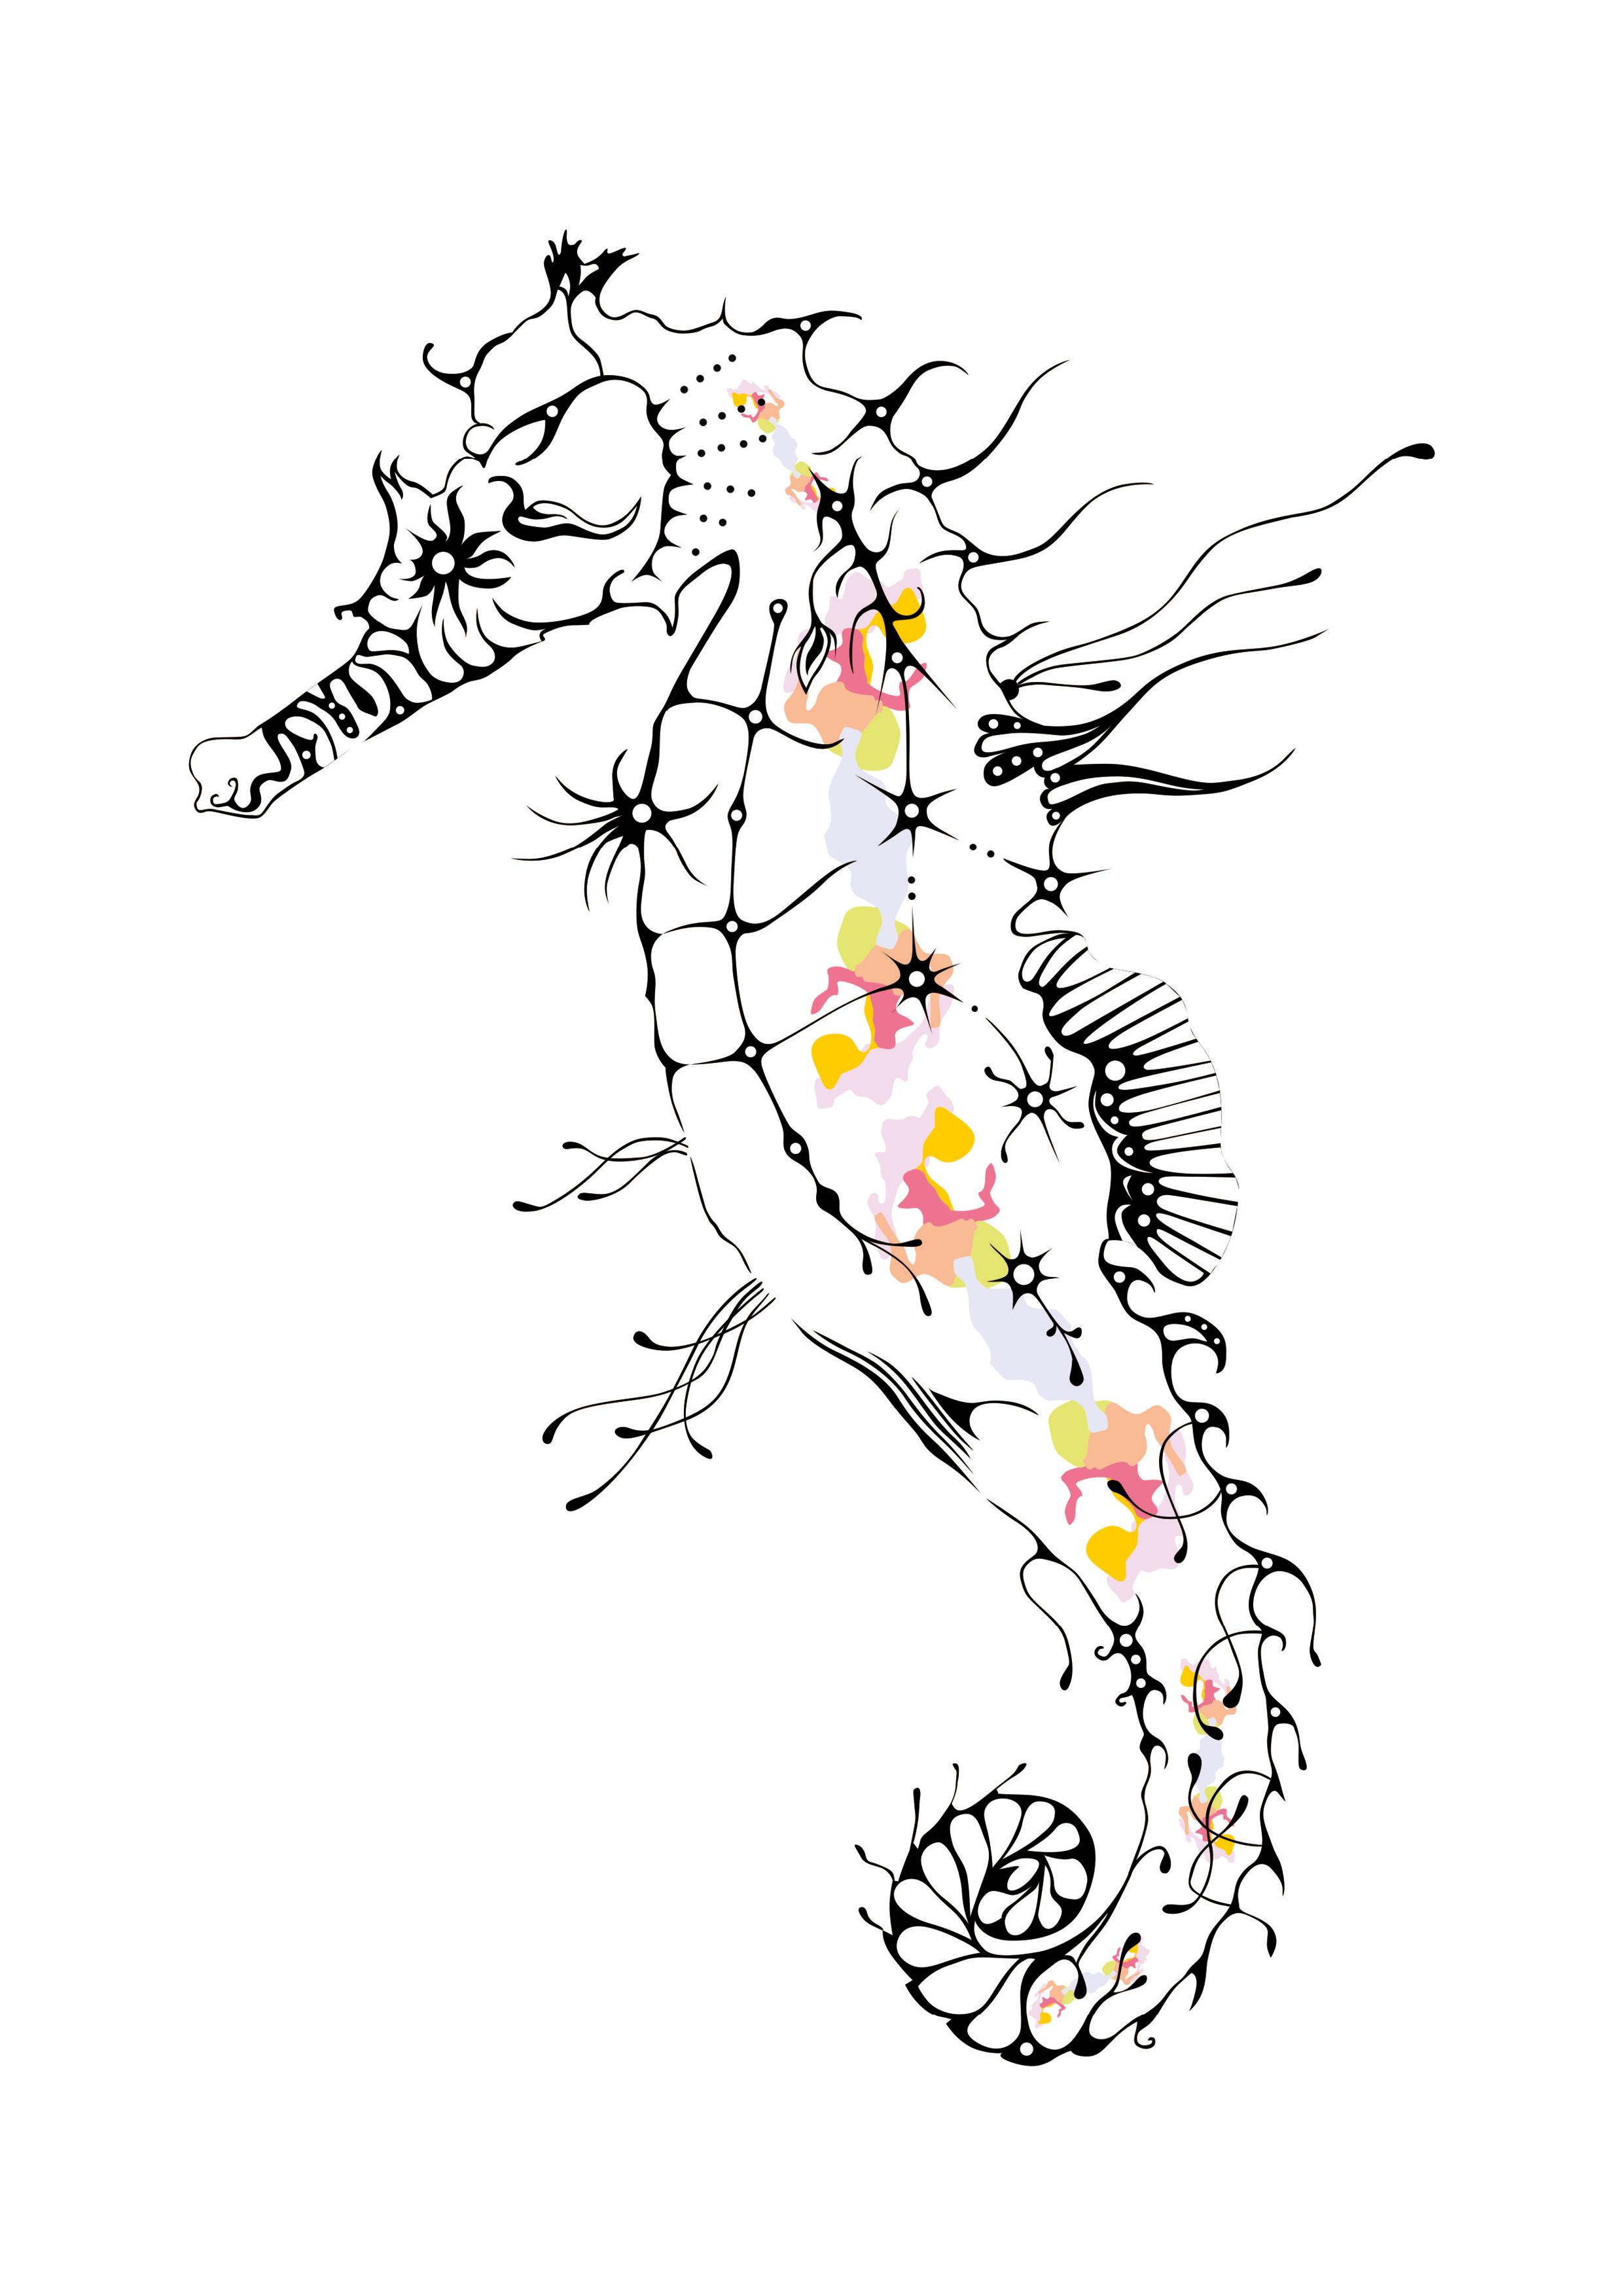 2480x3508 Seahorse, Drawing, Corel Draw Artwork Seahorse Drawing